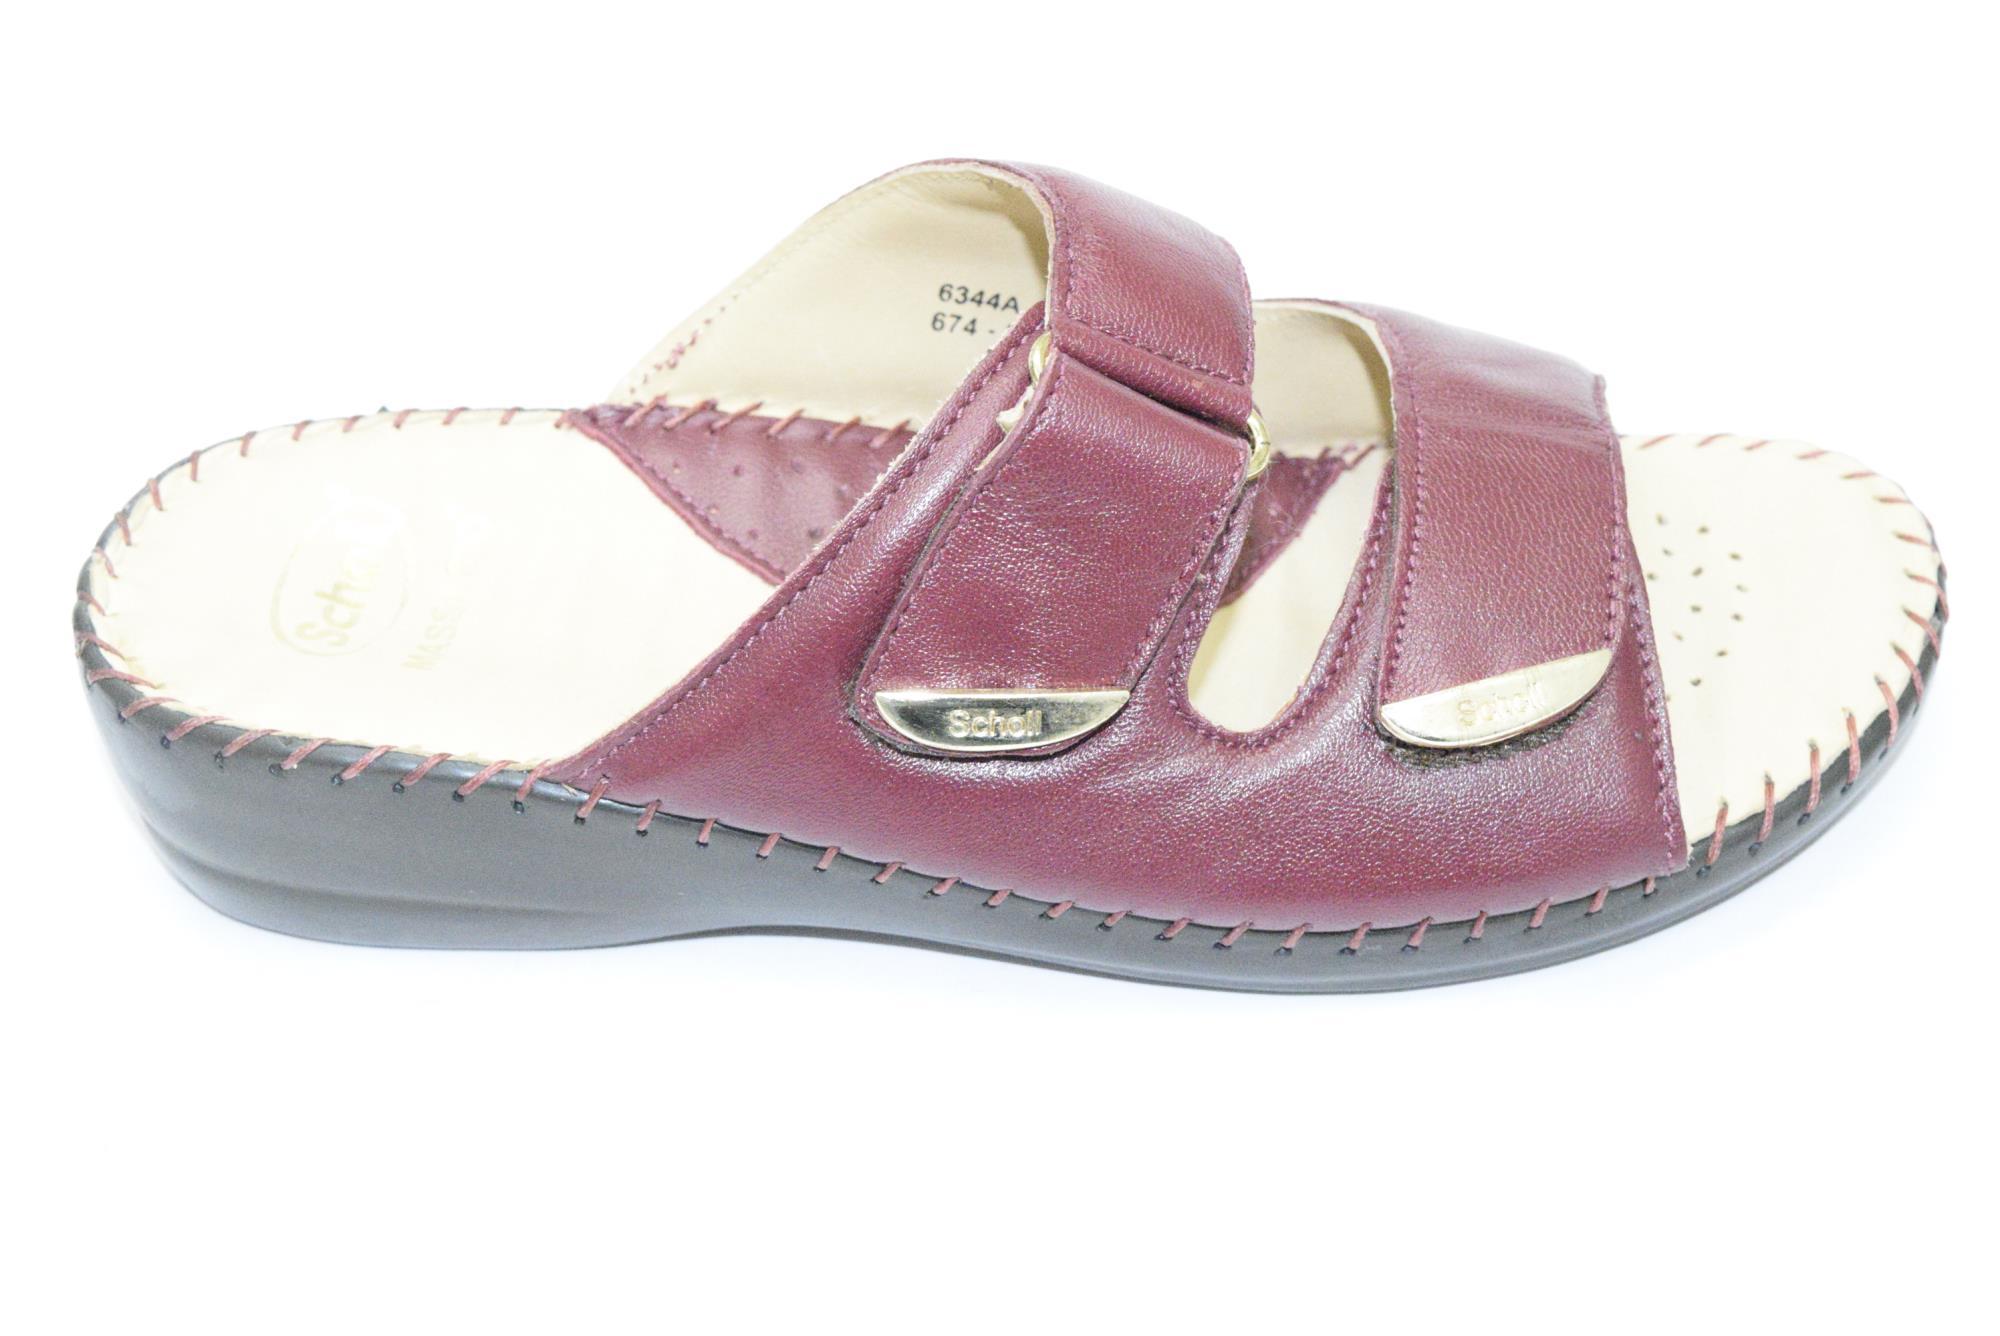 d91869414b88 Dr.Scholl Bata MAROON W.CHAPPAL    Online Shopping   PARMAR BOOT ...